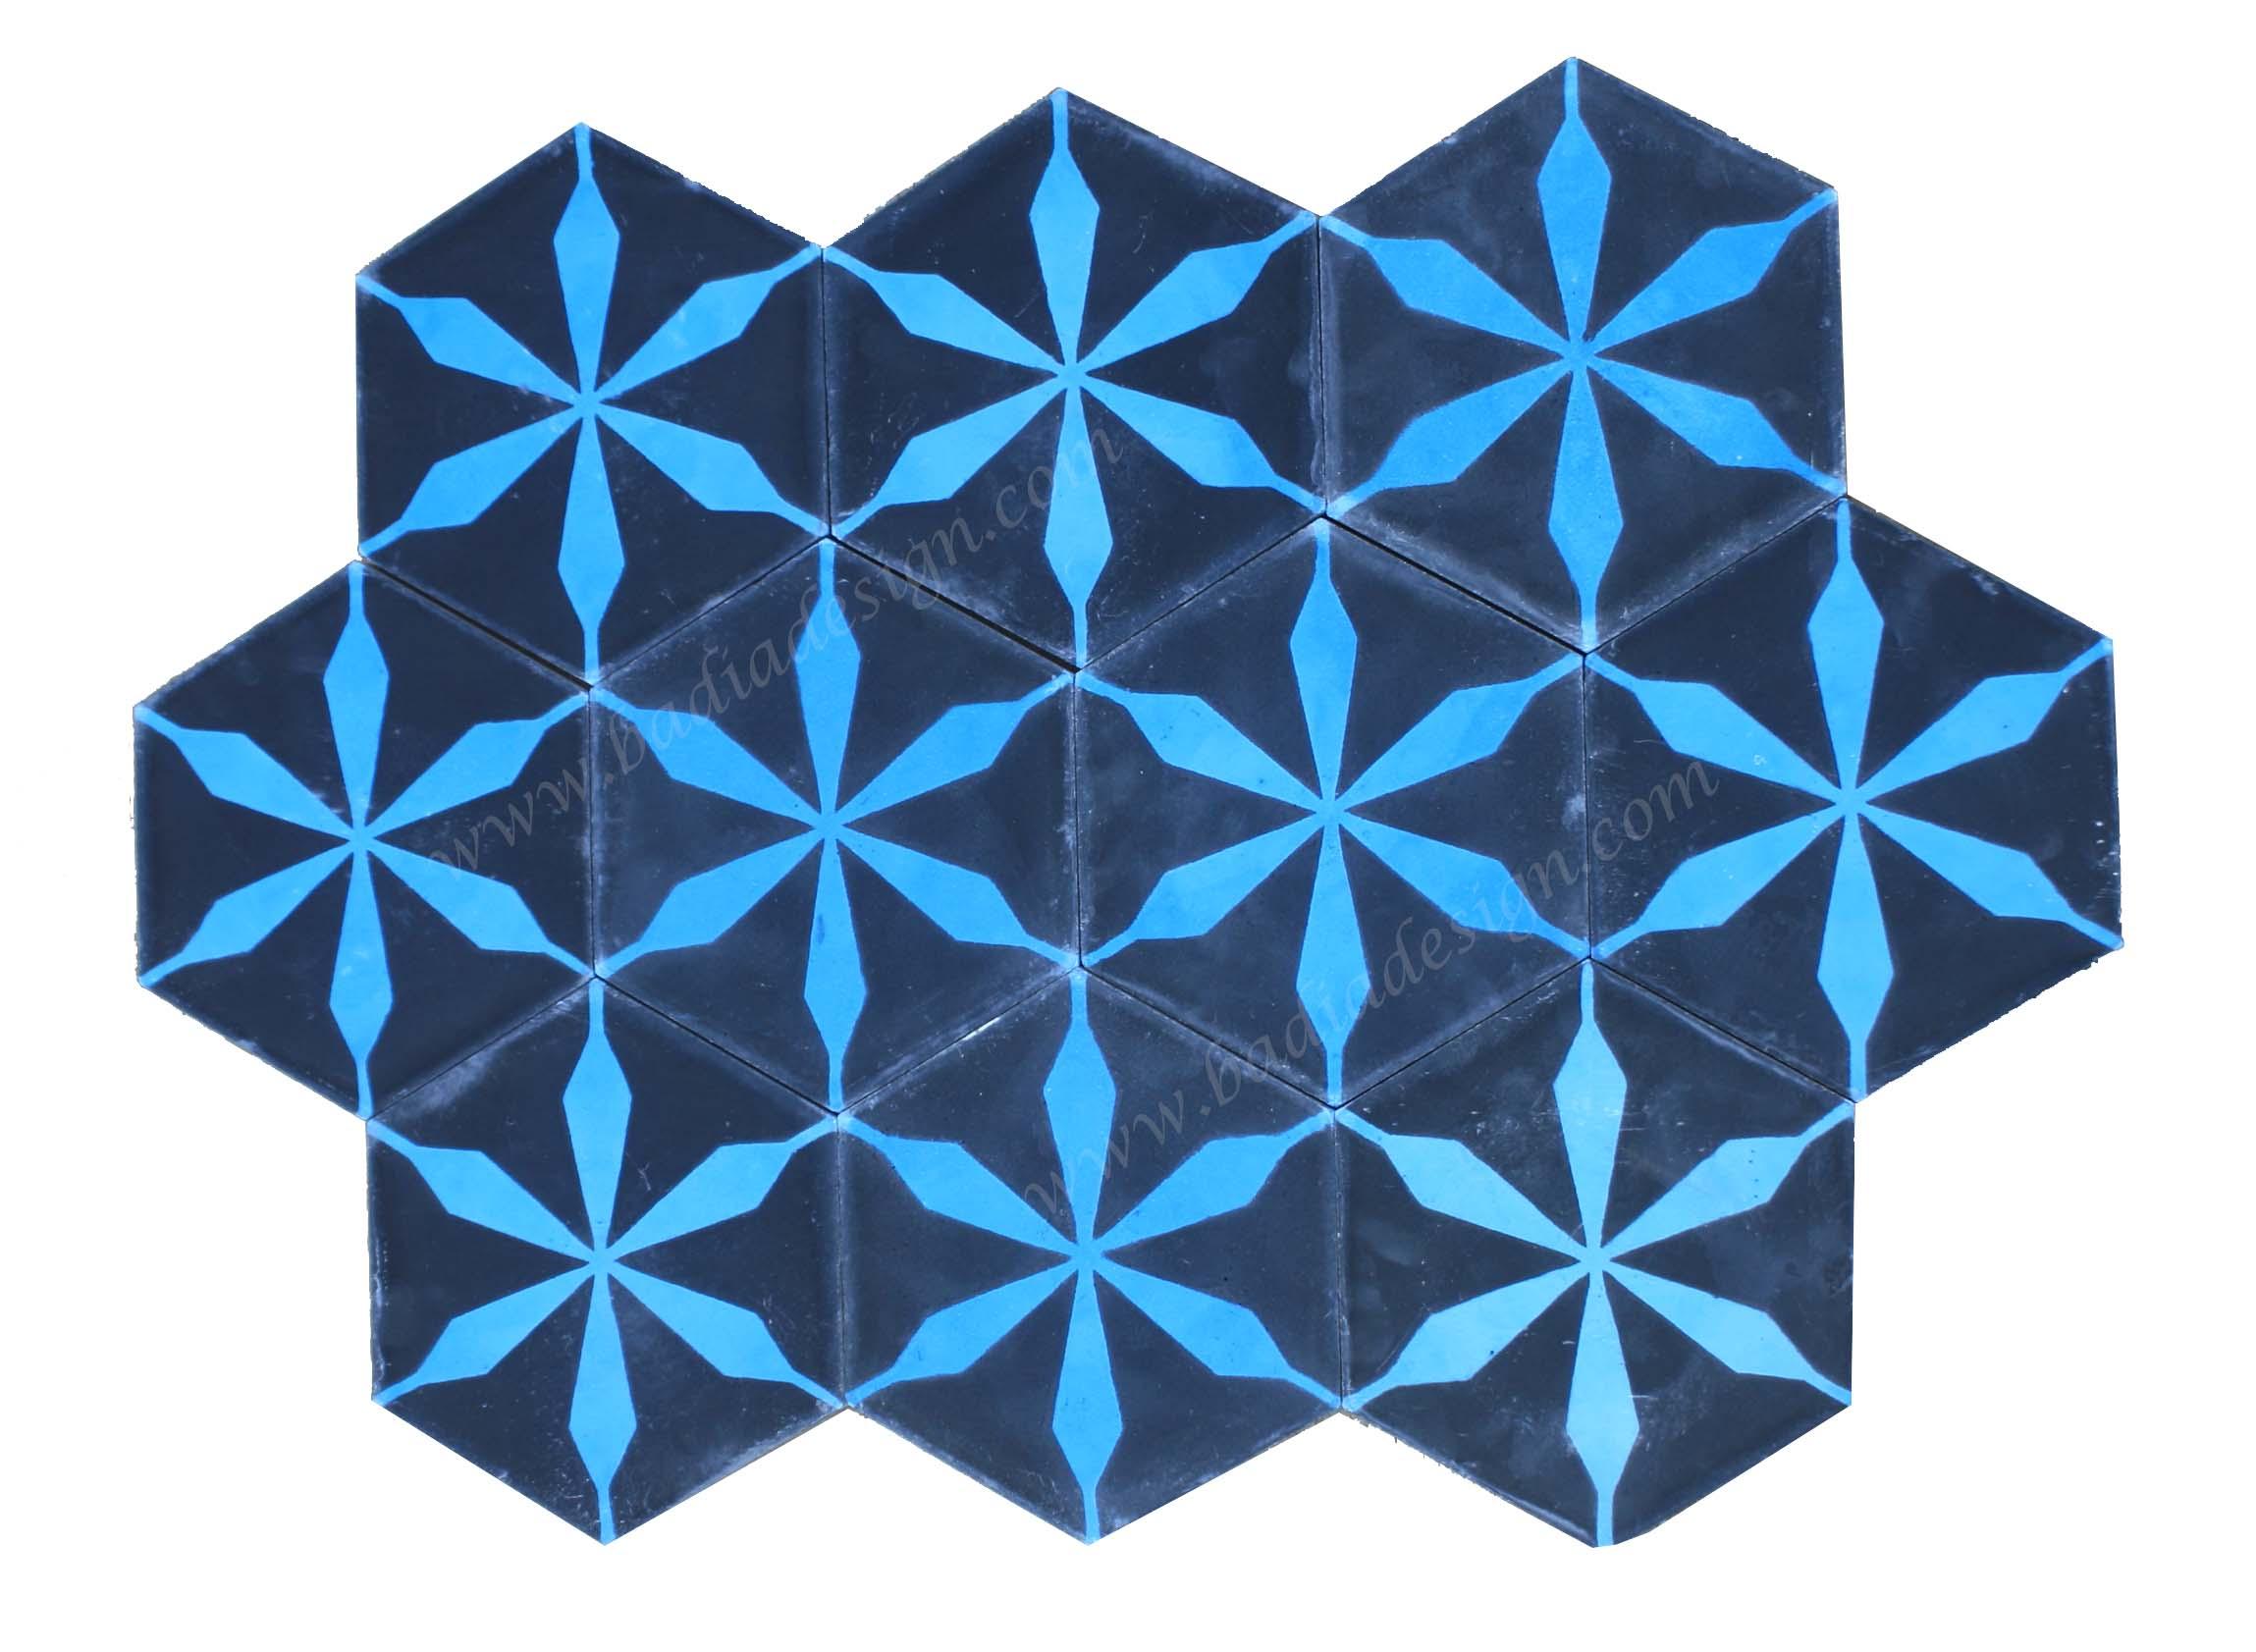 hexagon-shaped-handmade-cement-tile-ct100-1.jpg